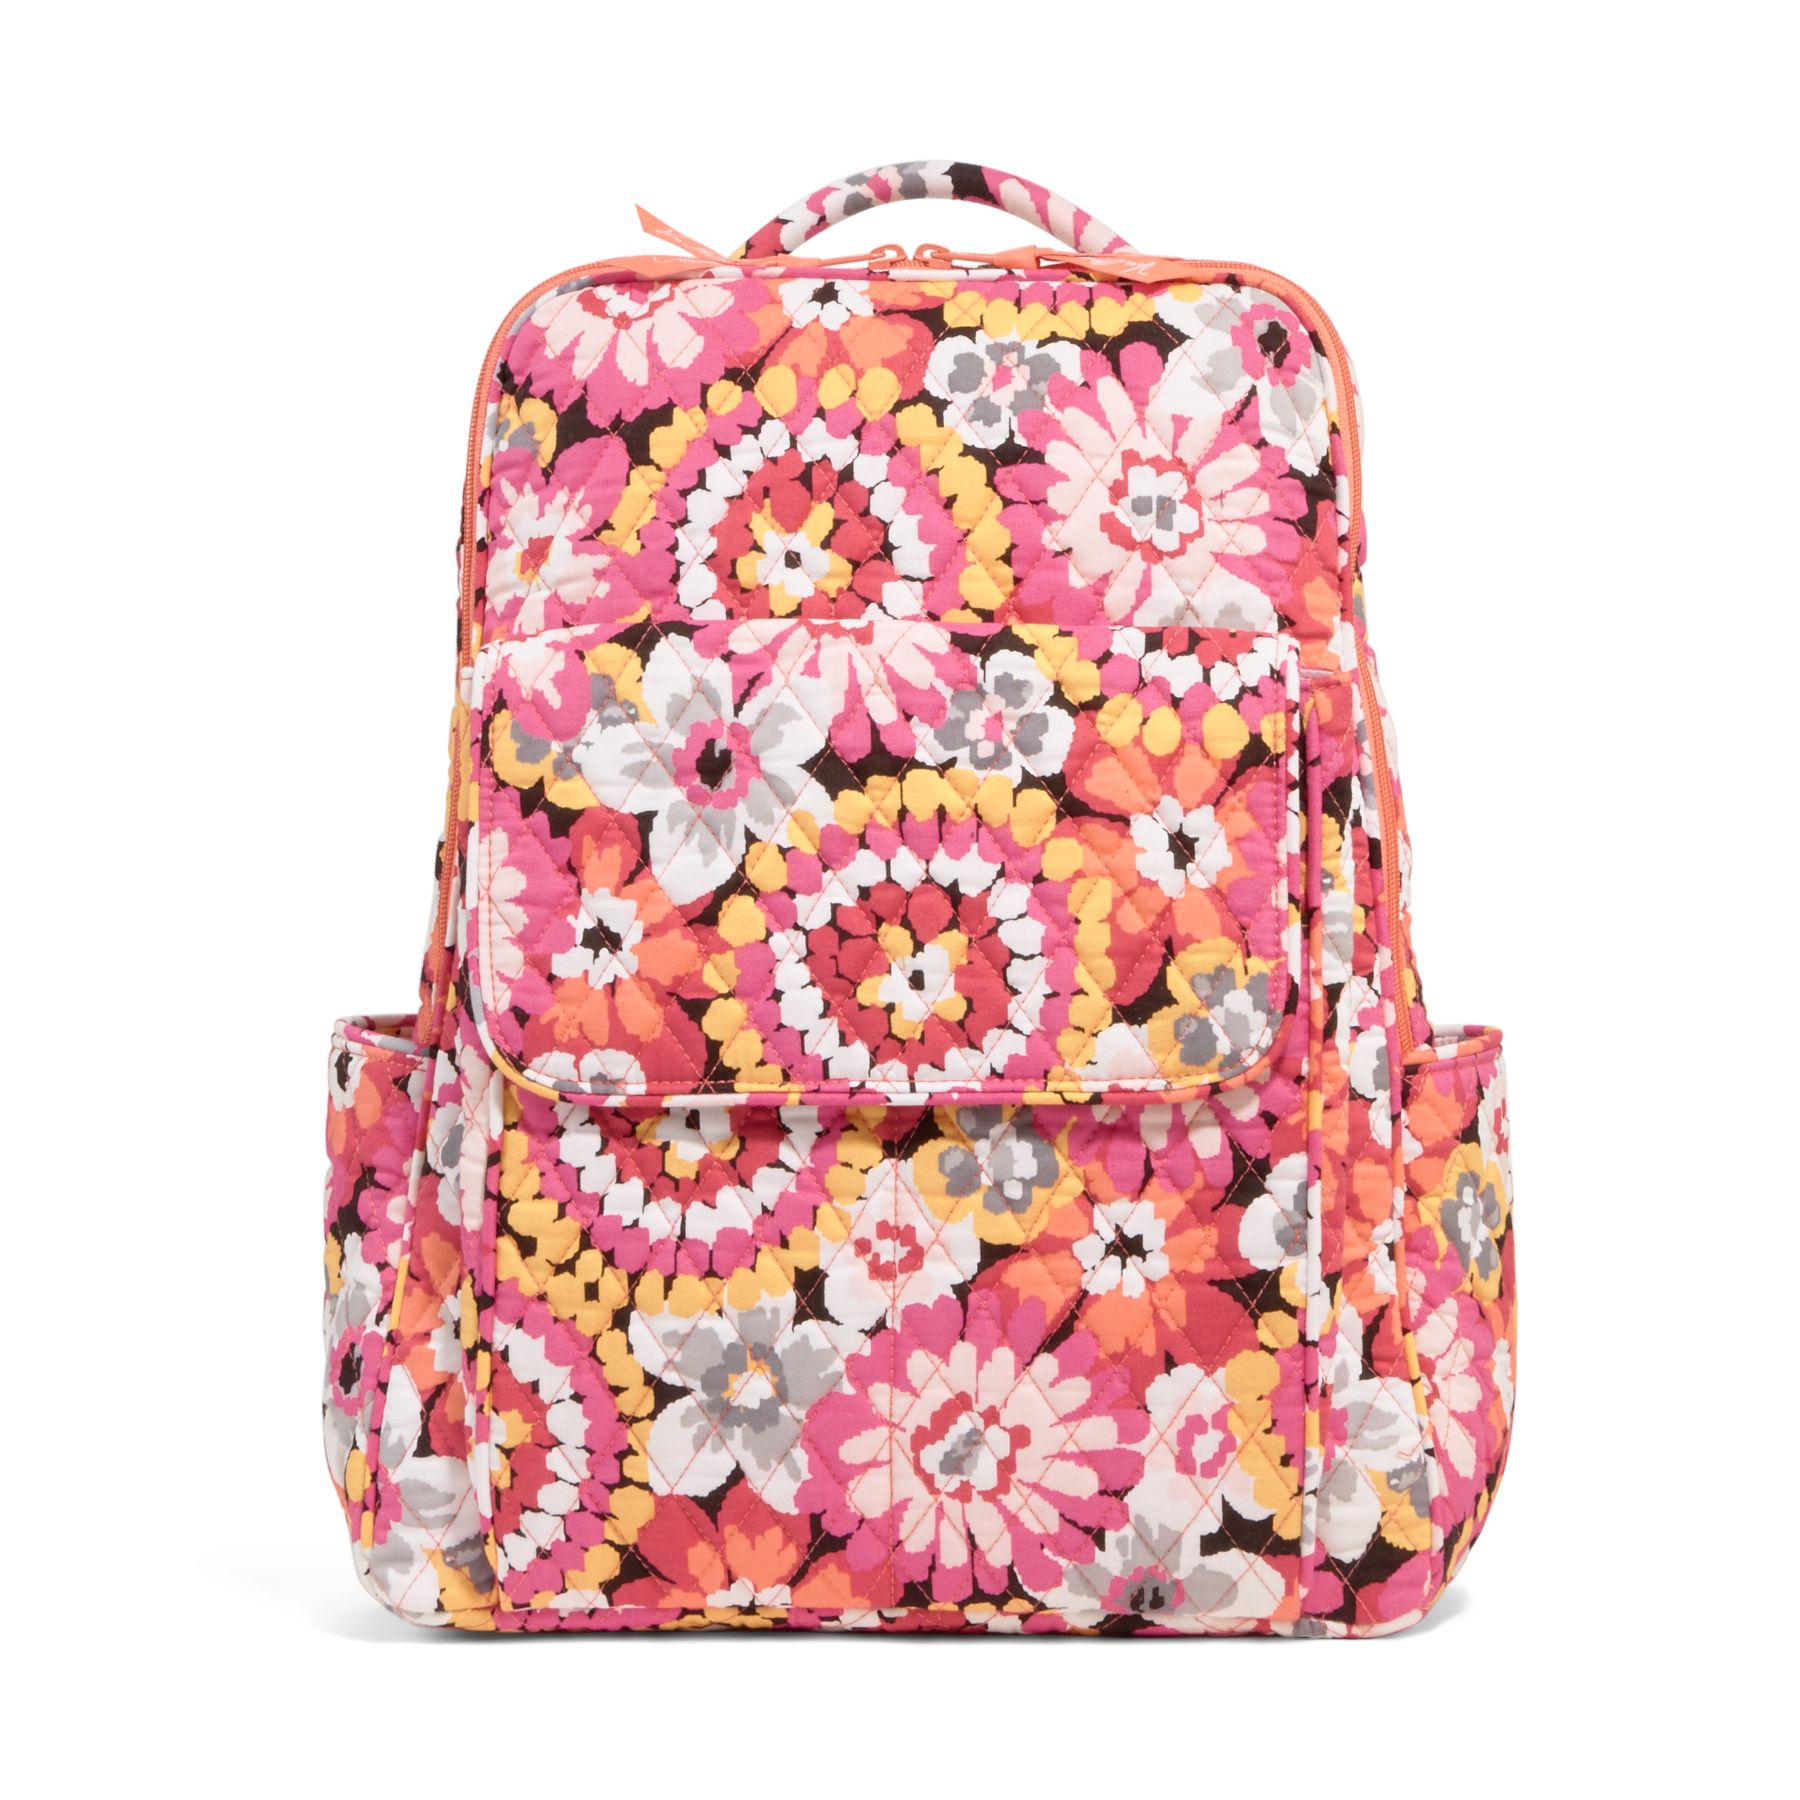 Up To 40% Off | Vera Bradley Handbag Sale. Save up to 40% on Vera Bradley goodies with this sale.